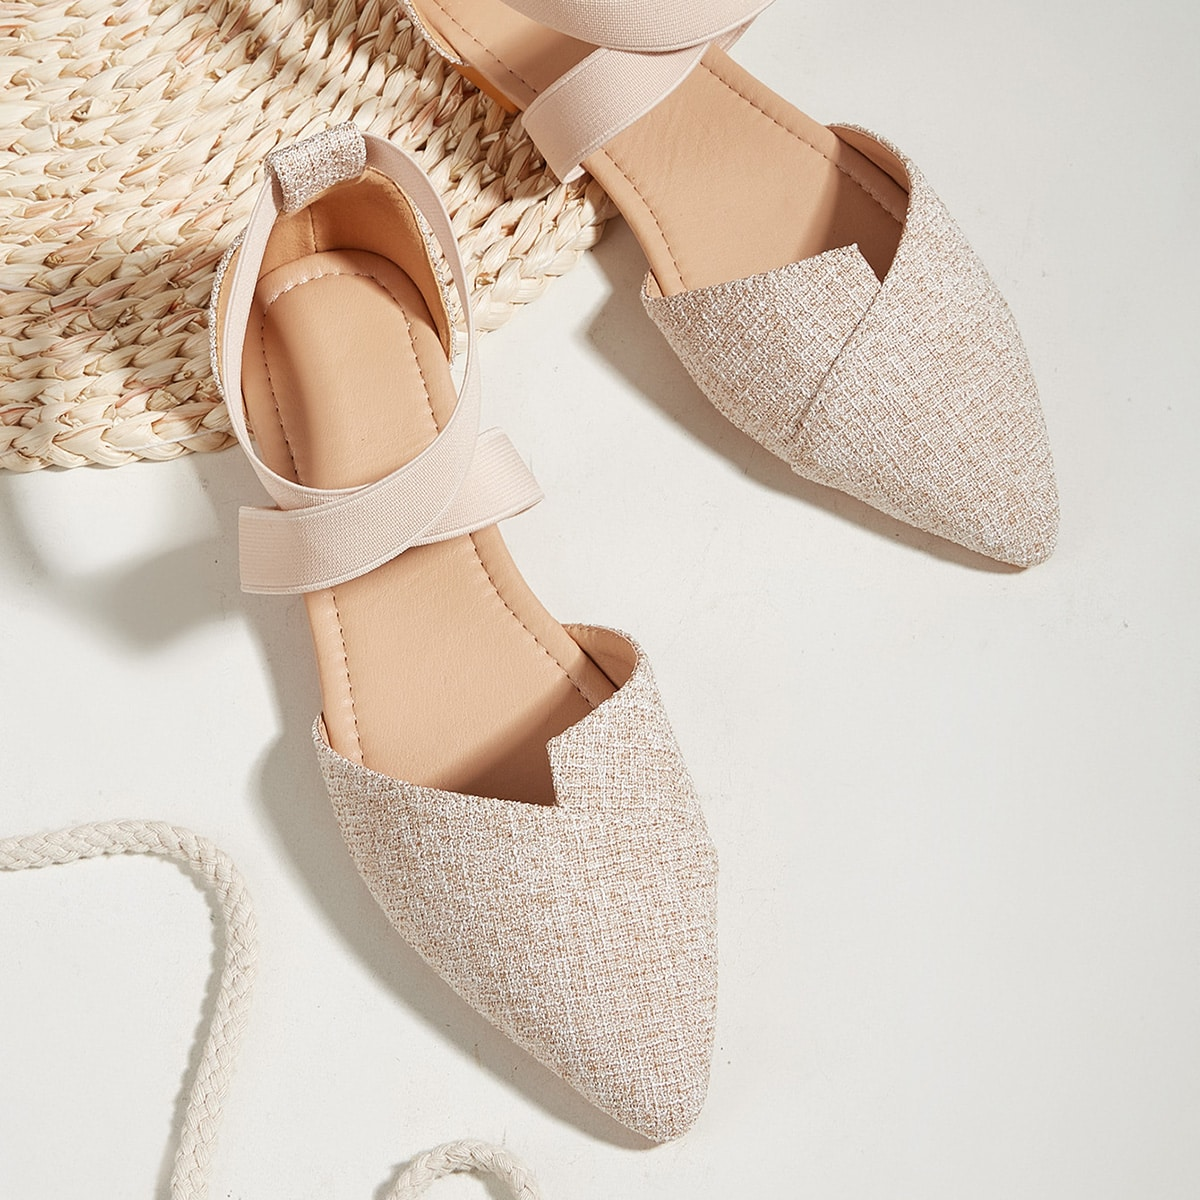 Chaussures plates minimaliste